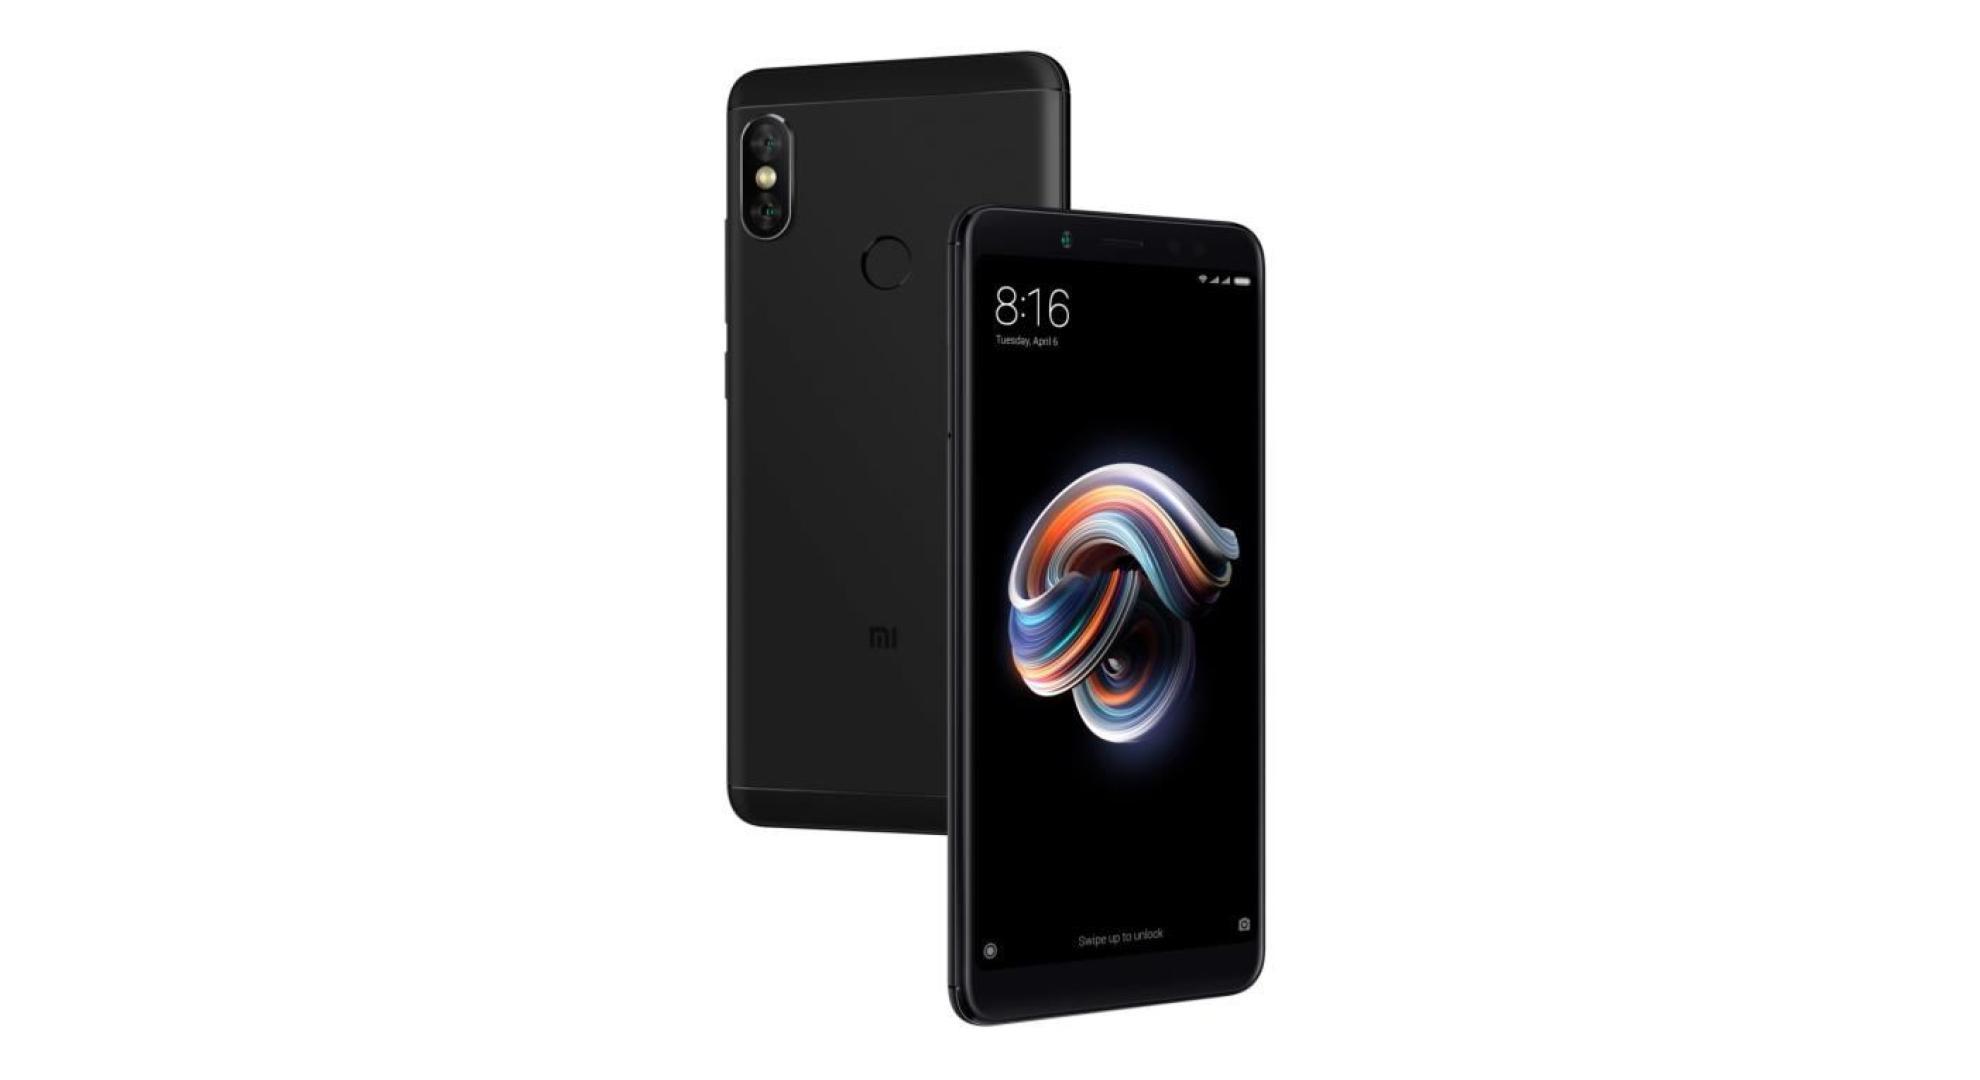 🔥 Bon plan : le Xiaomi Redmi Note 5 (64 Go) descend à 160 euros avec ce code promo